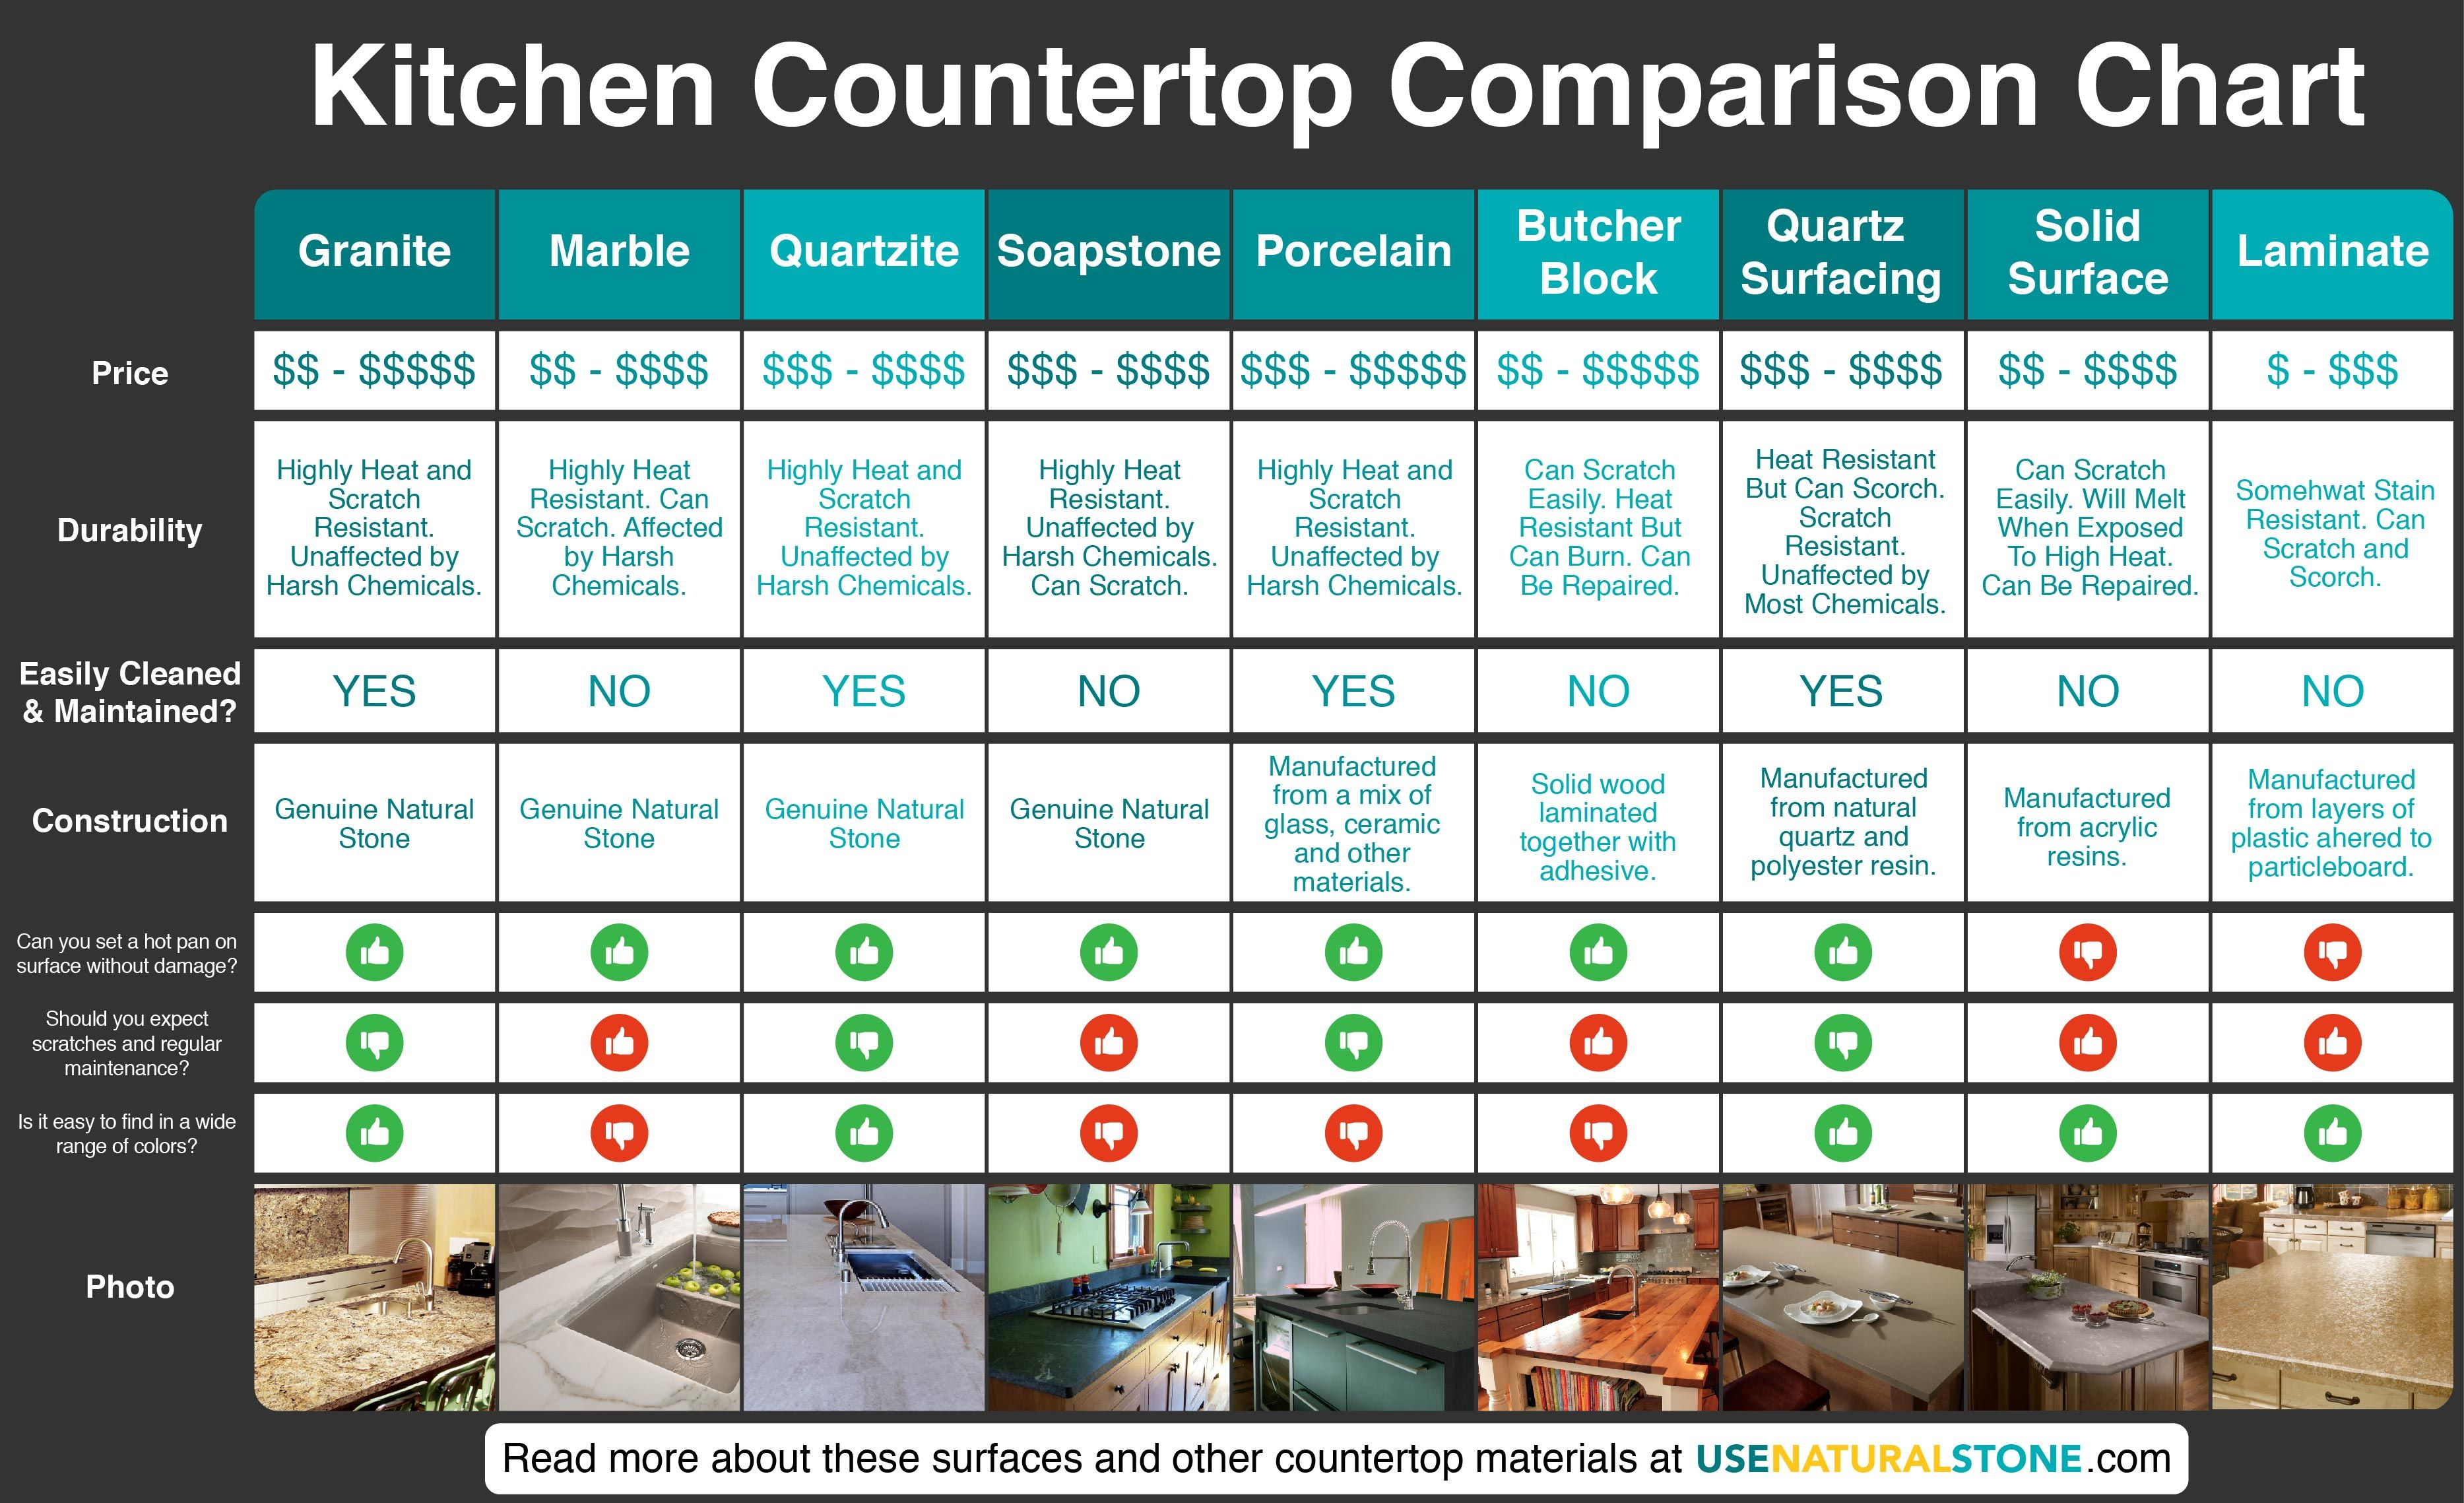 Countertop Comparison Chart | Countertop materials ...